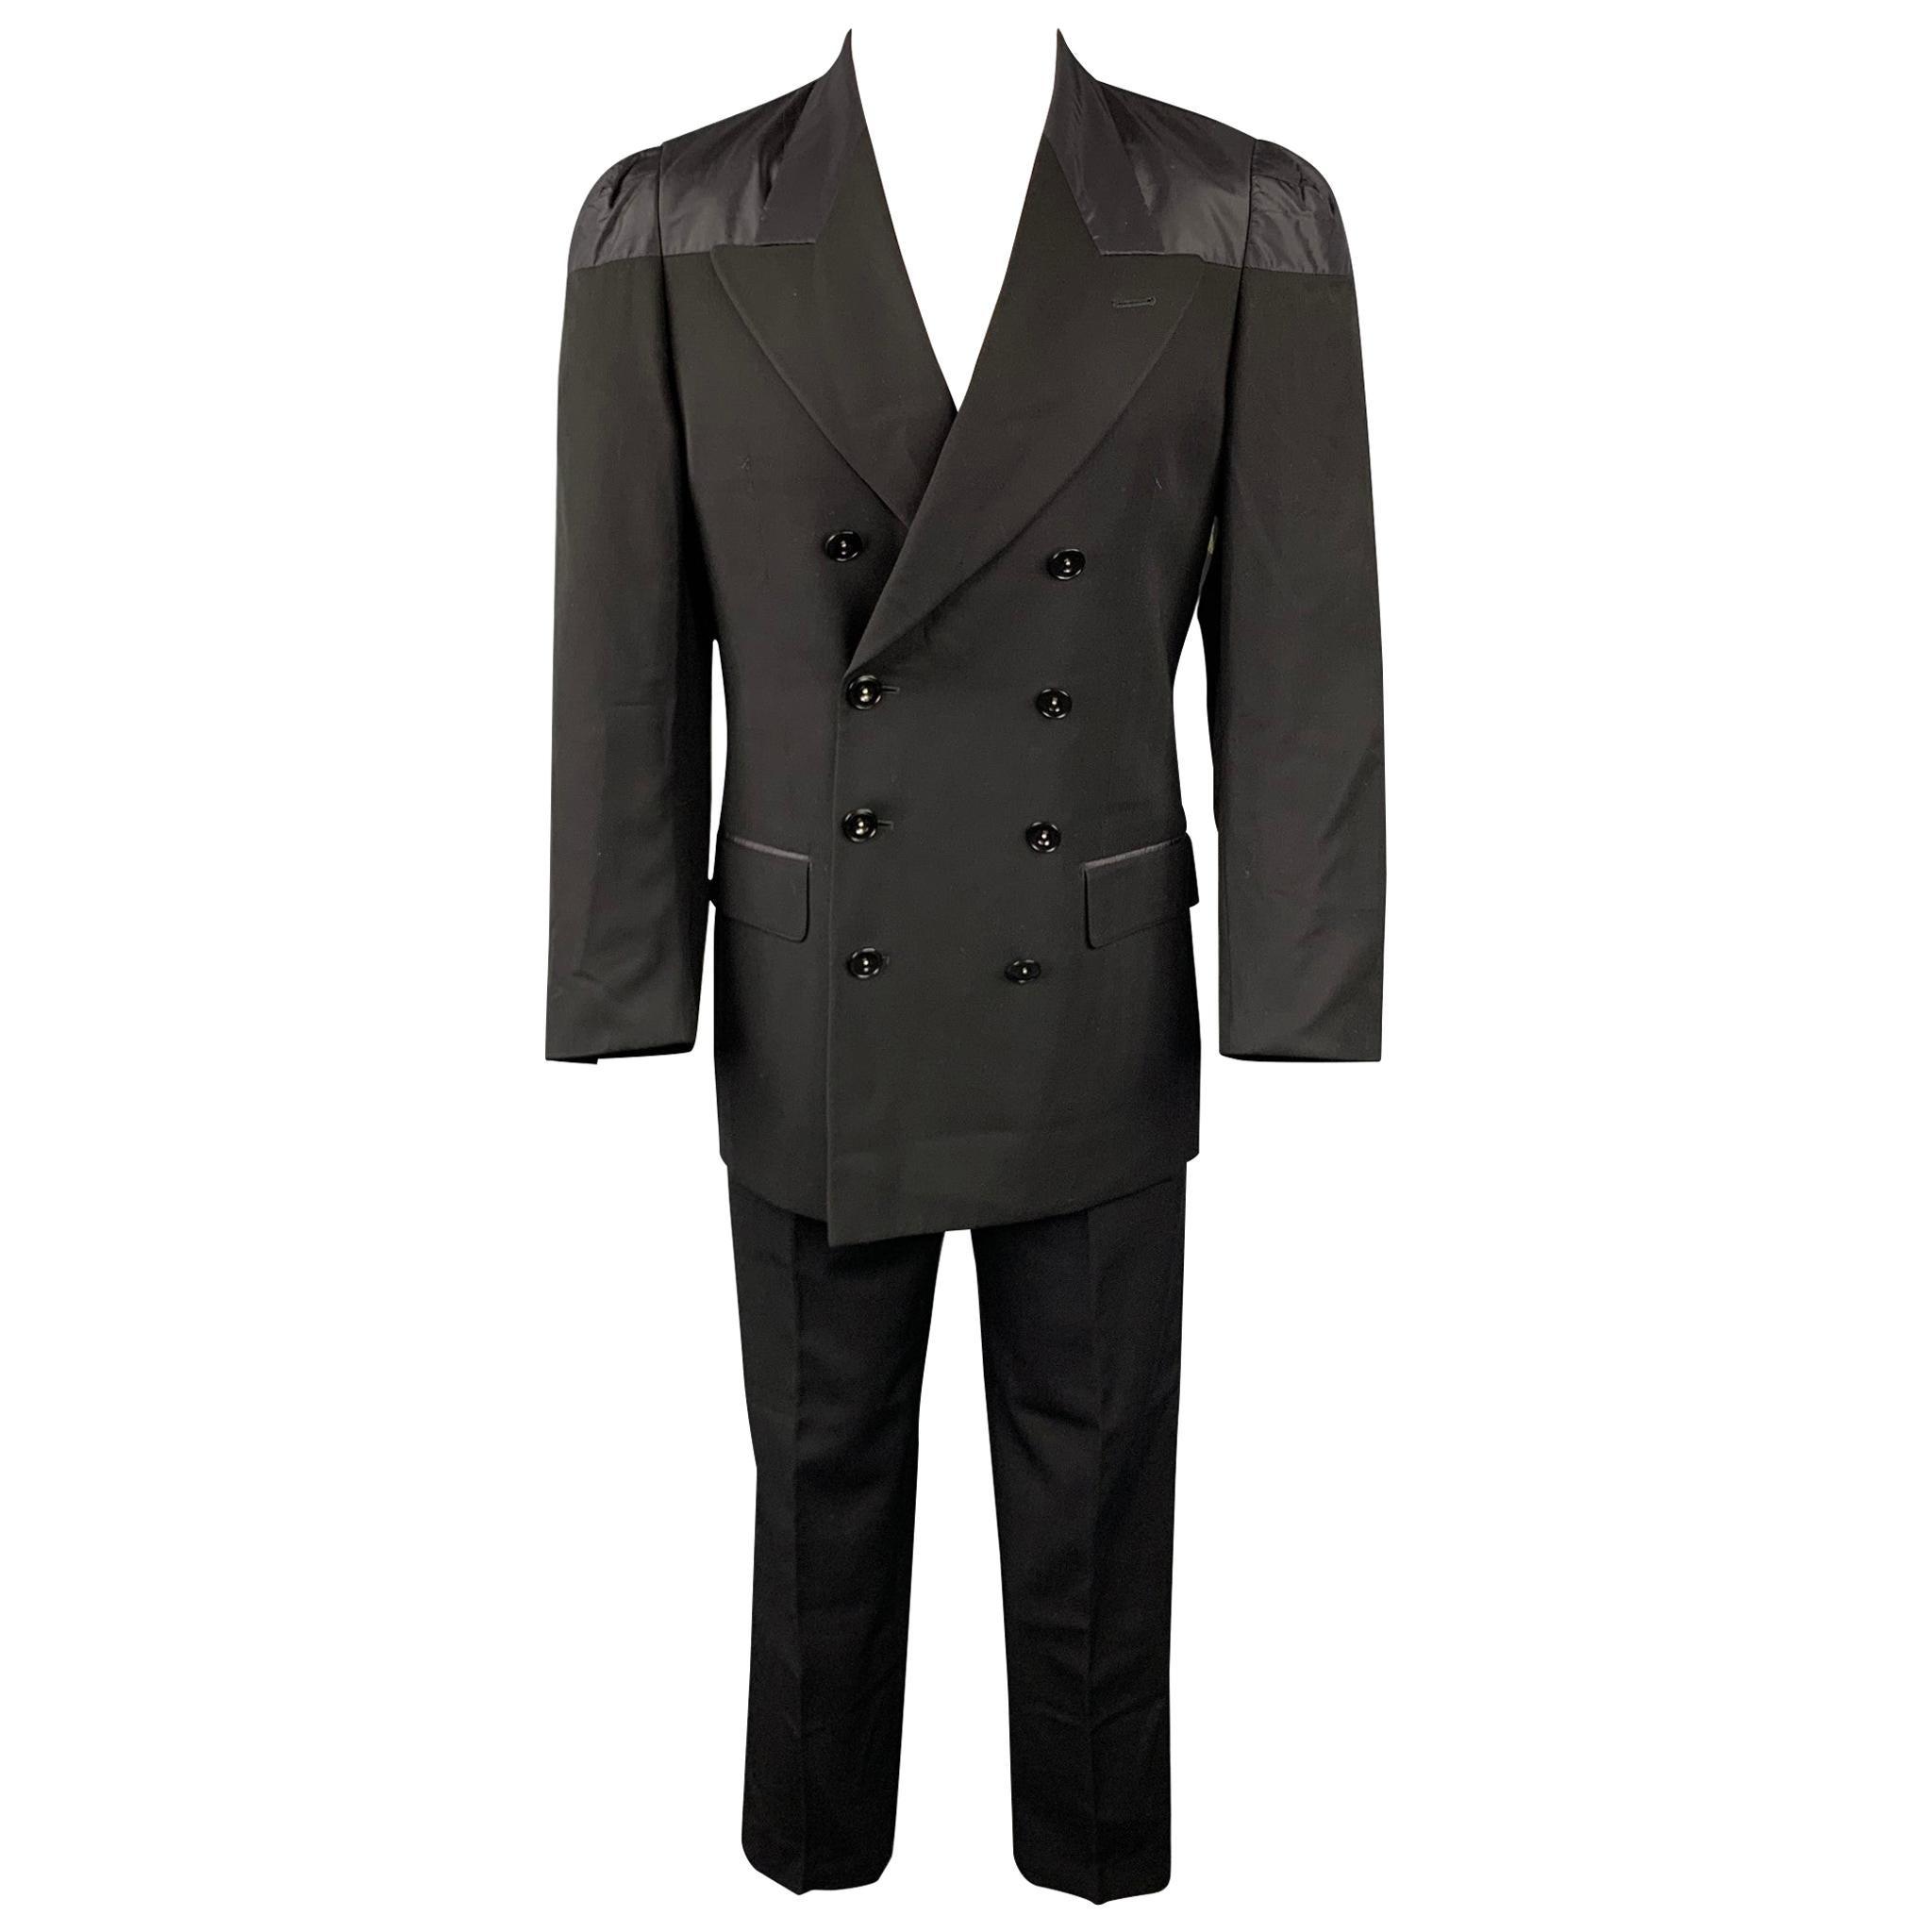 JEAN PAUL GAULTIER CLASSIQUE Size 38 Black Wool Peak Lapel Double Breasted Suit